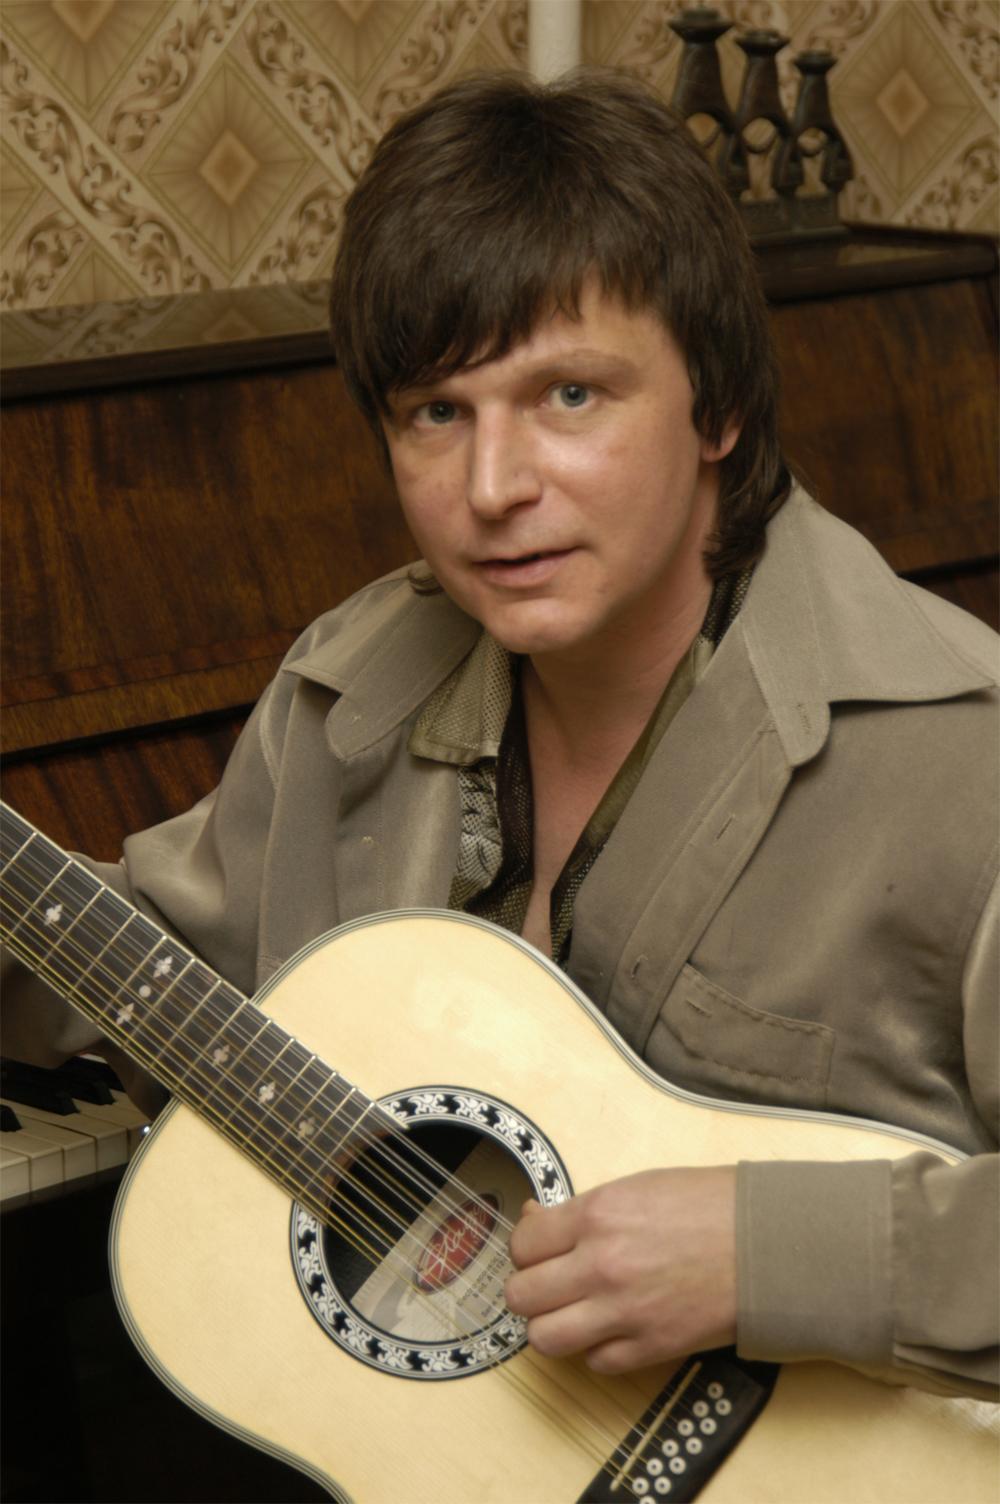 Олег Кацура, 2004 г.